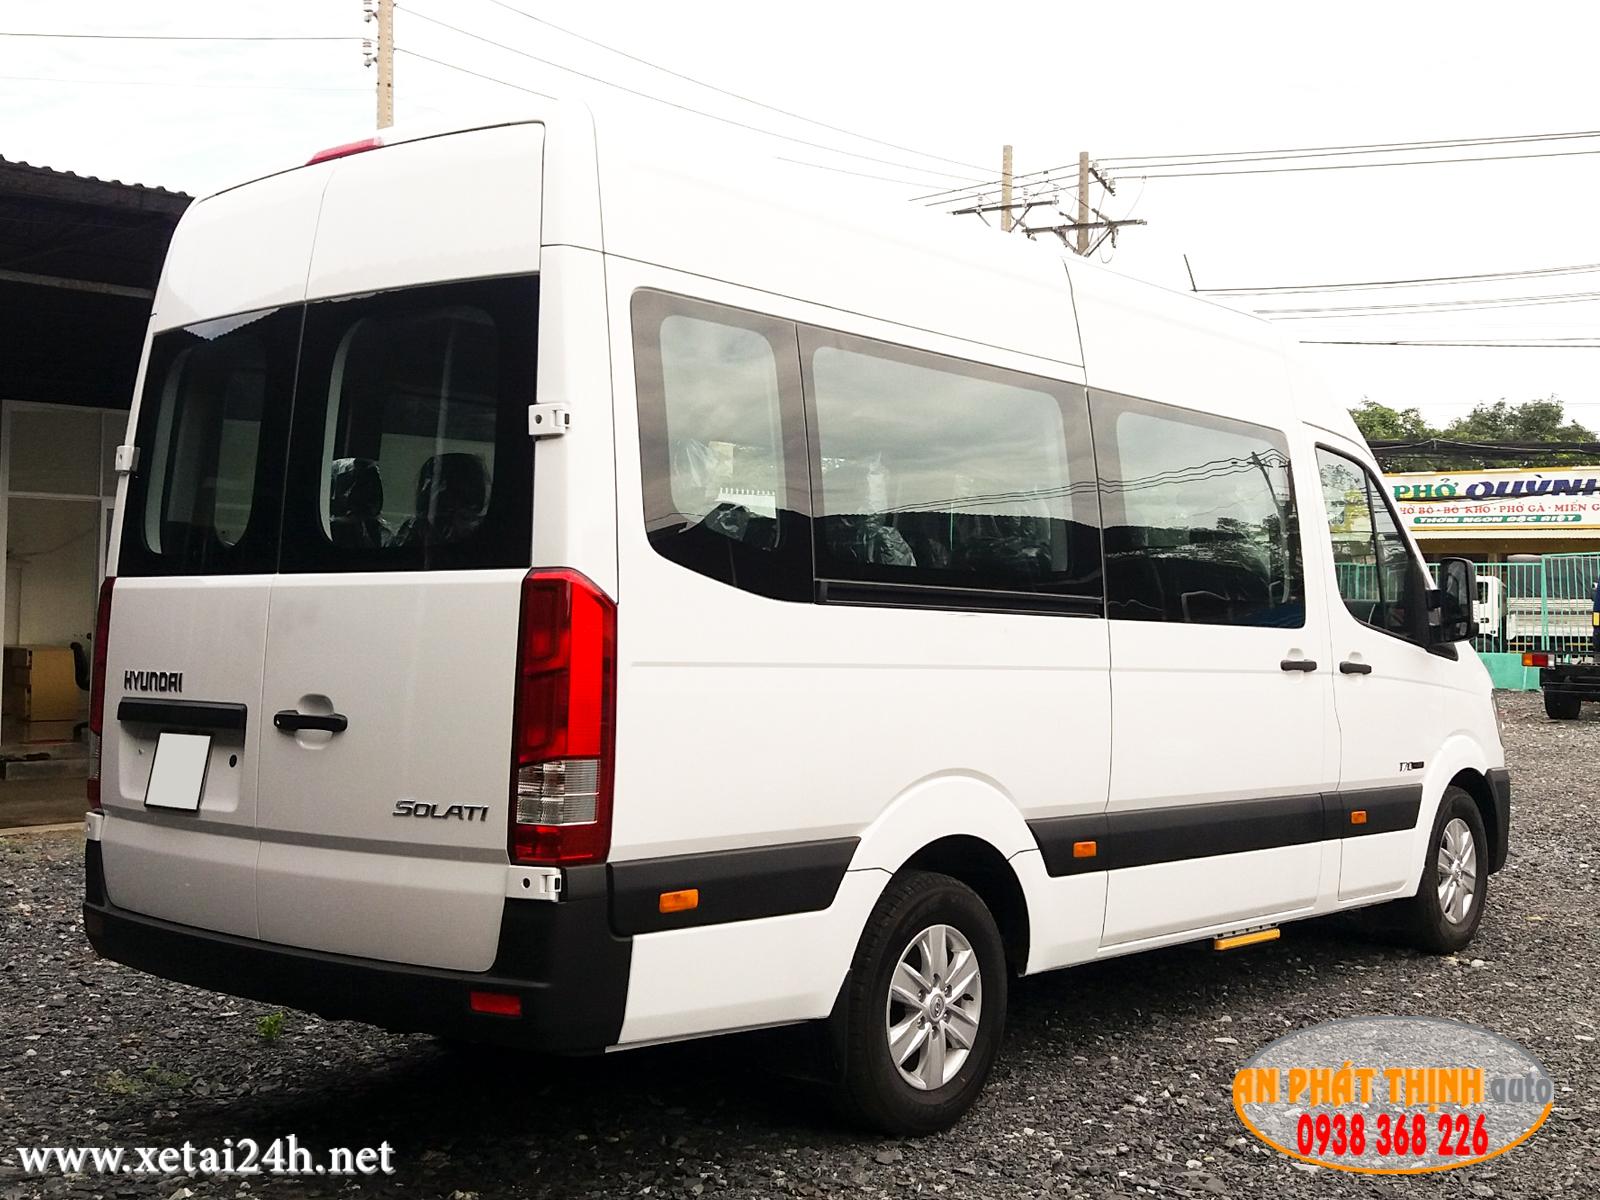 xe solati 16 cho hyundai h350